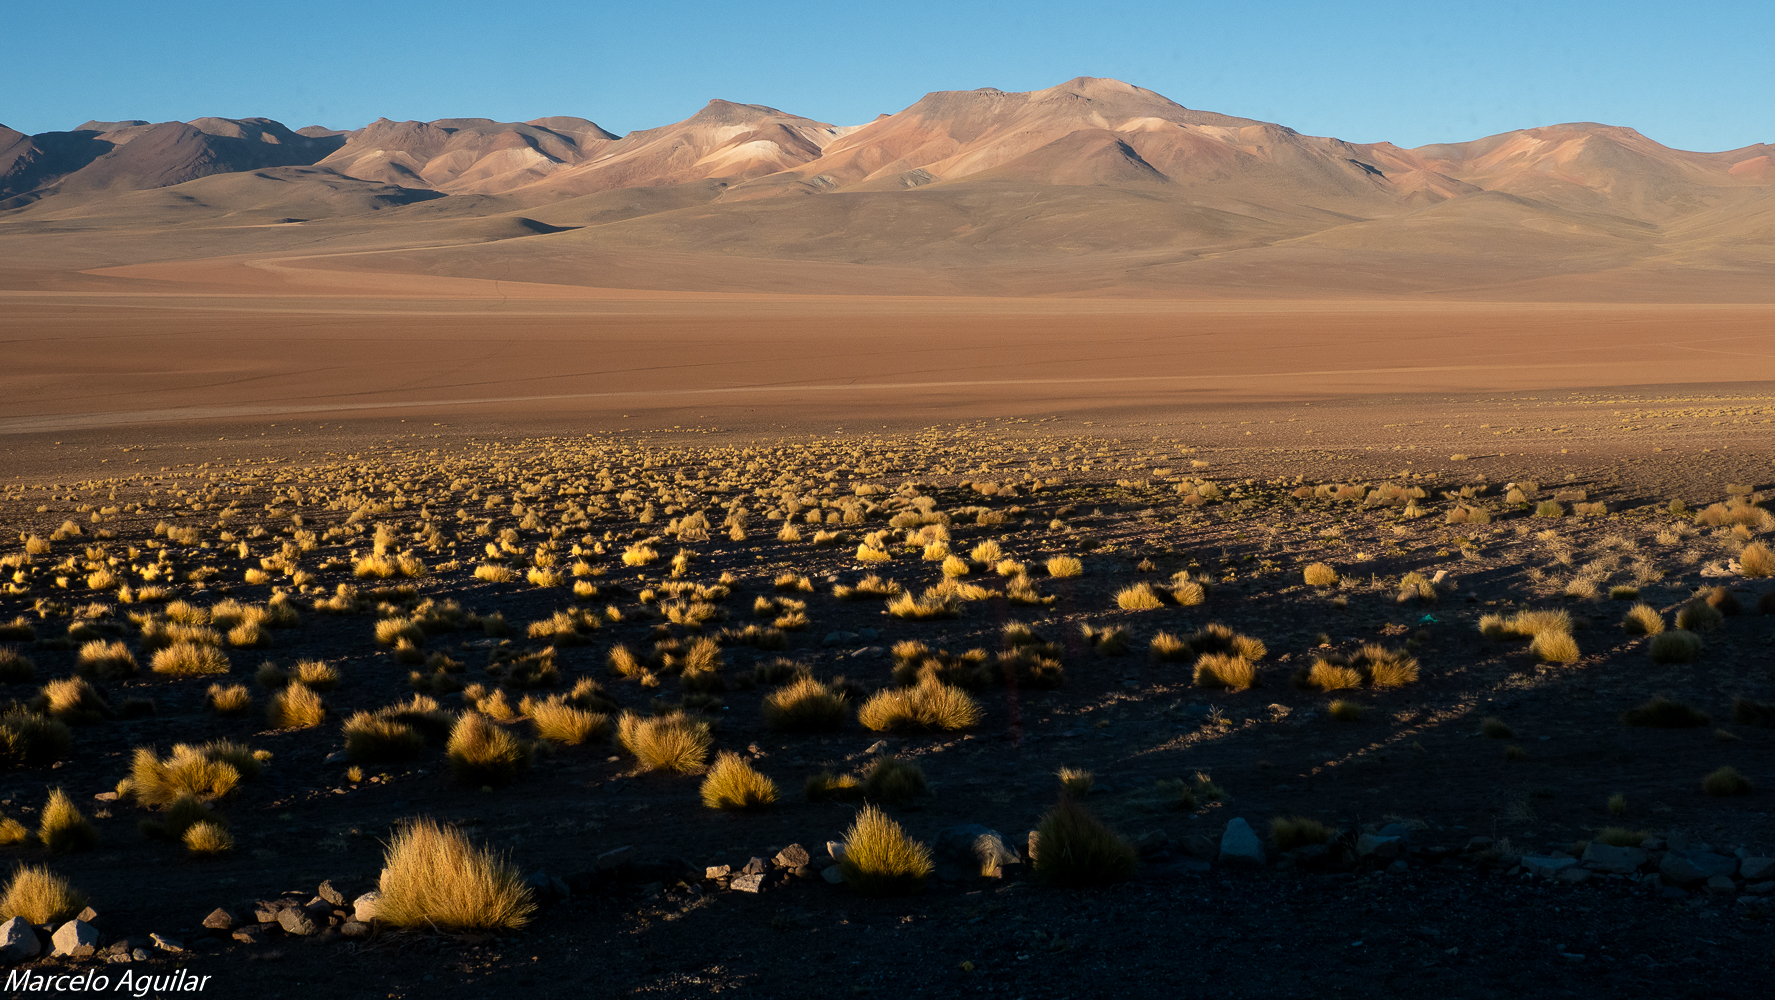 Tayka del Desierto, Bolivia